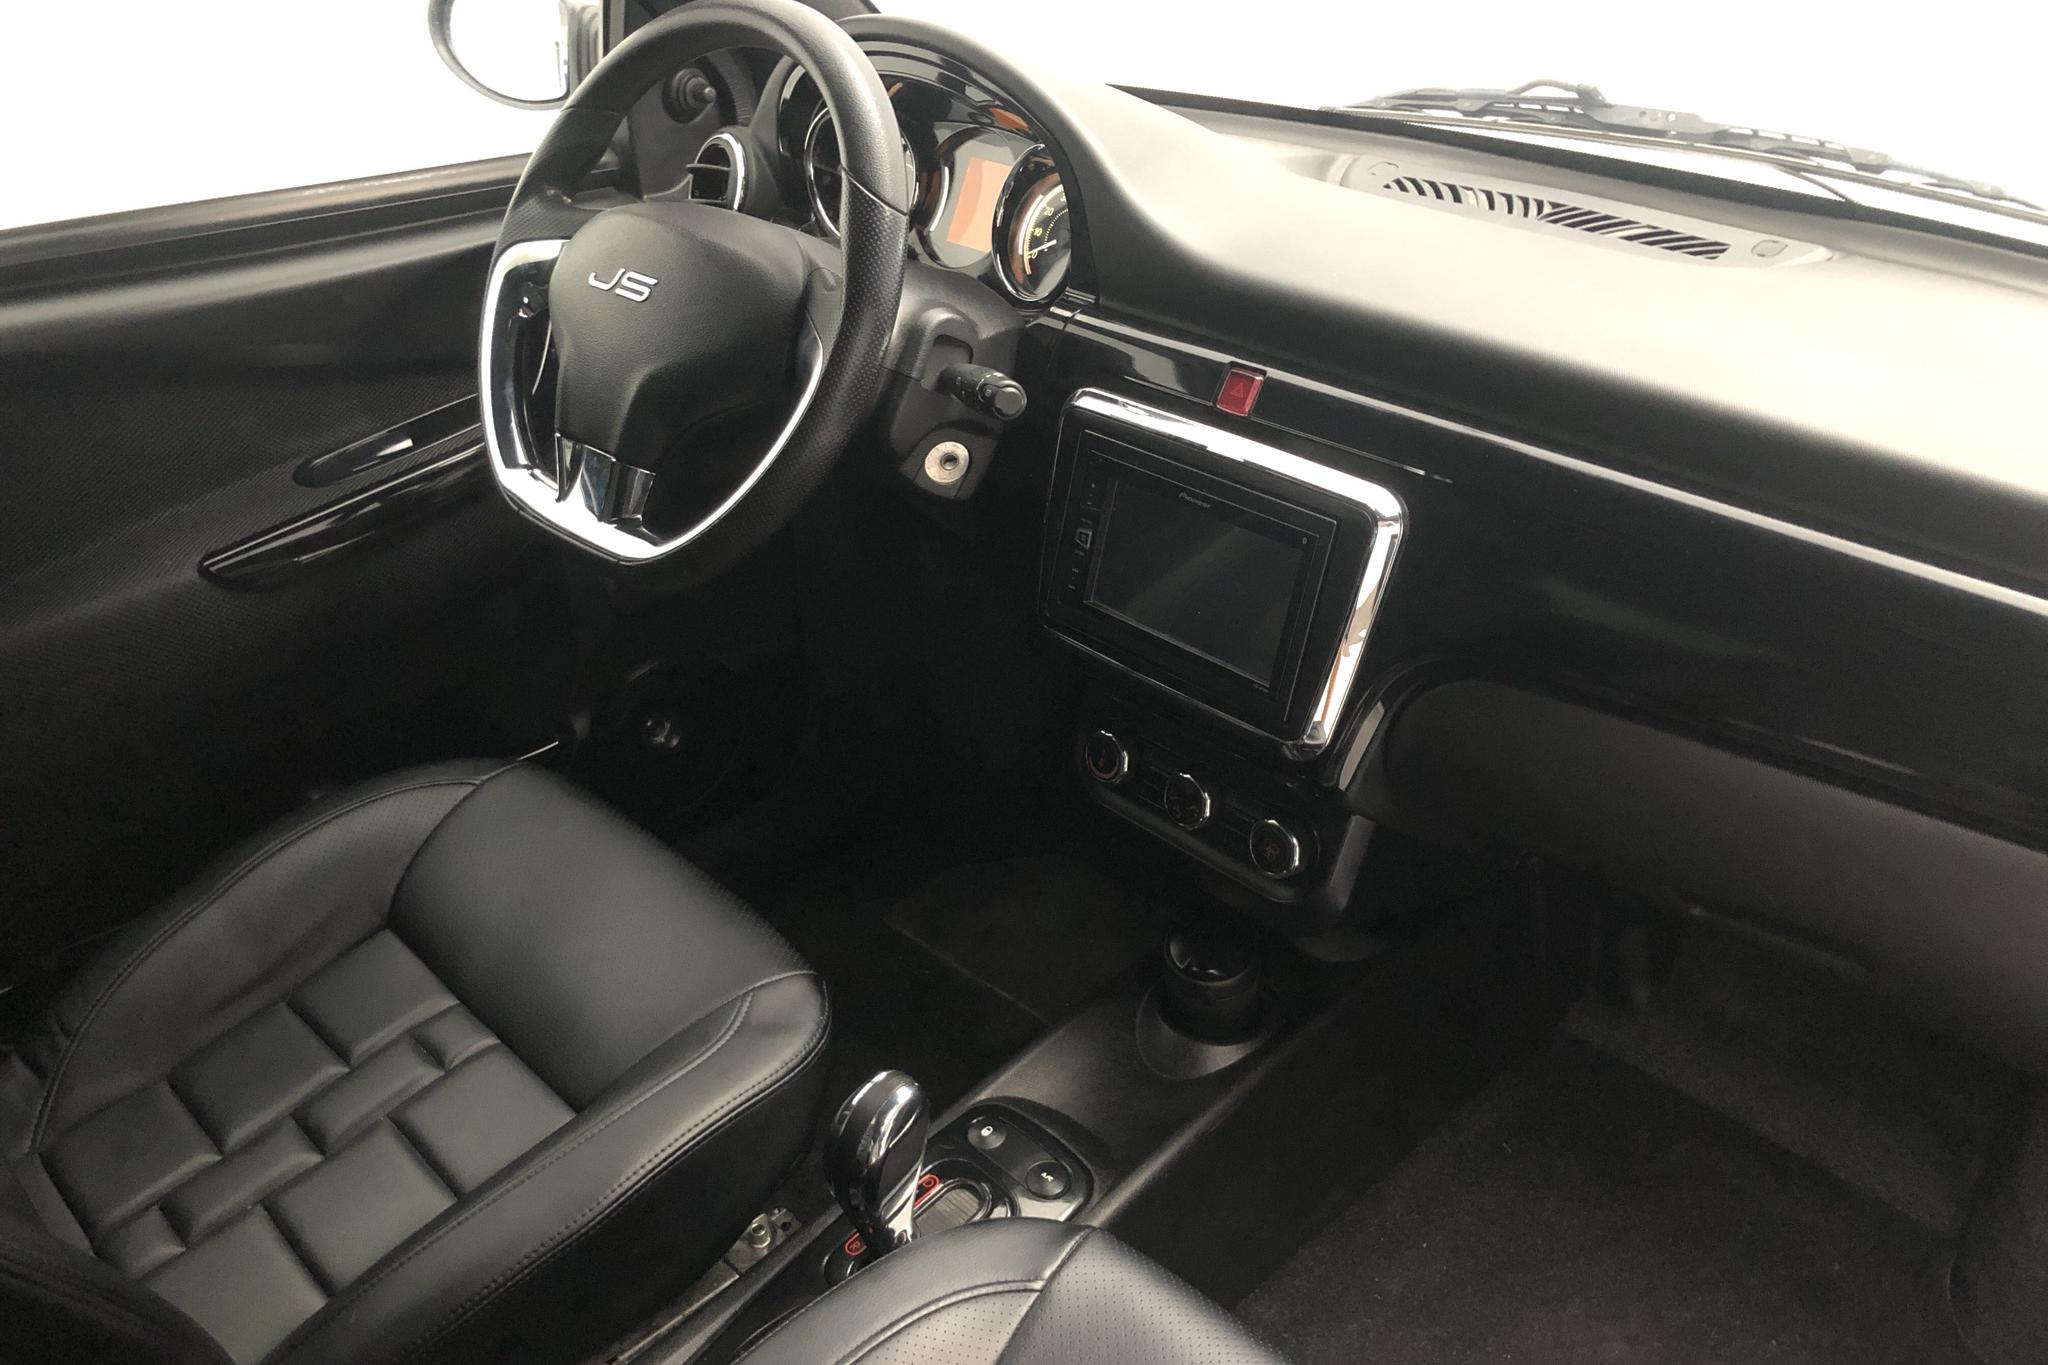 LIGIER JS50 Mopedbil - 4 112 mil - Automat - 2017